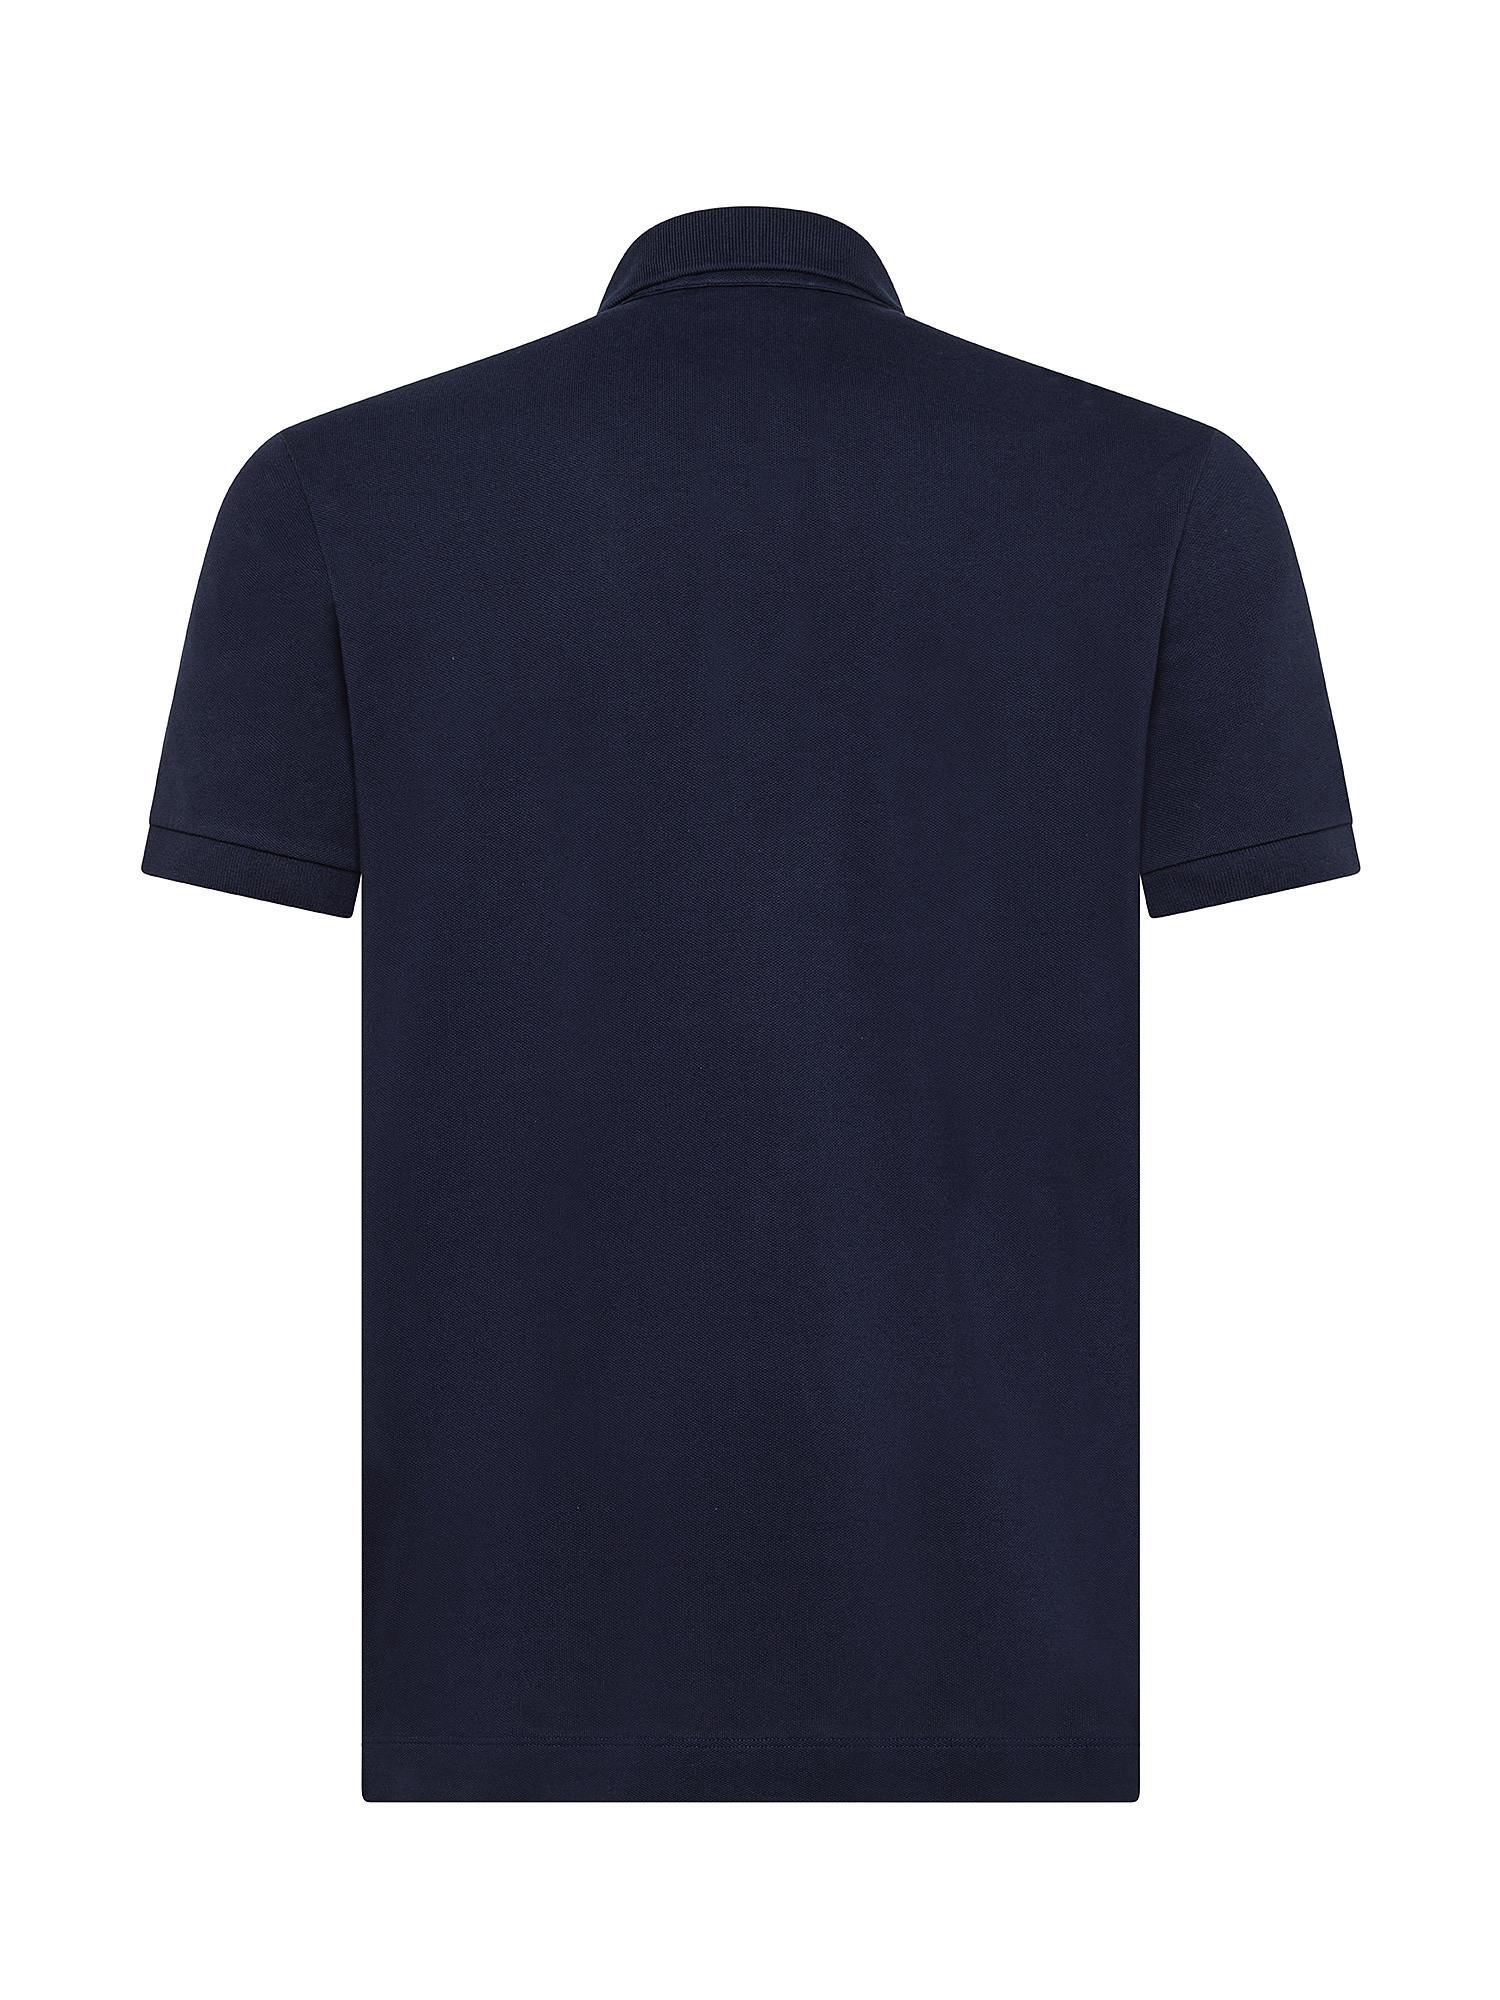 Polo regular fit di cotone, Blu, large image number 1